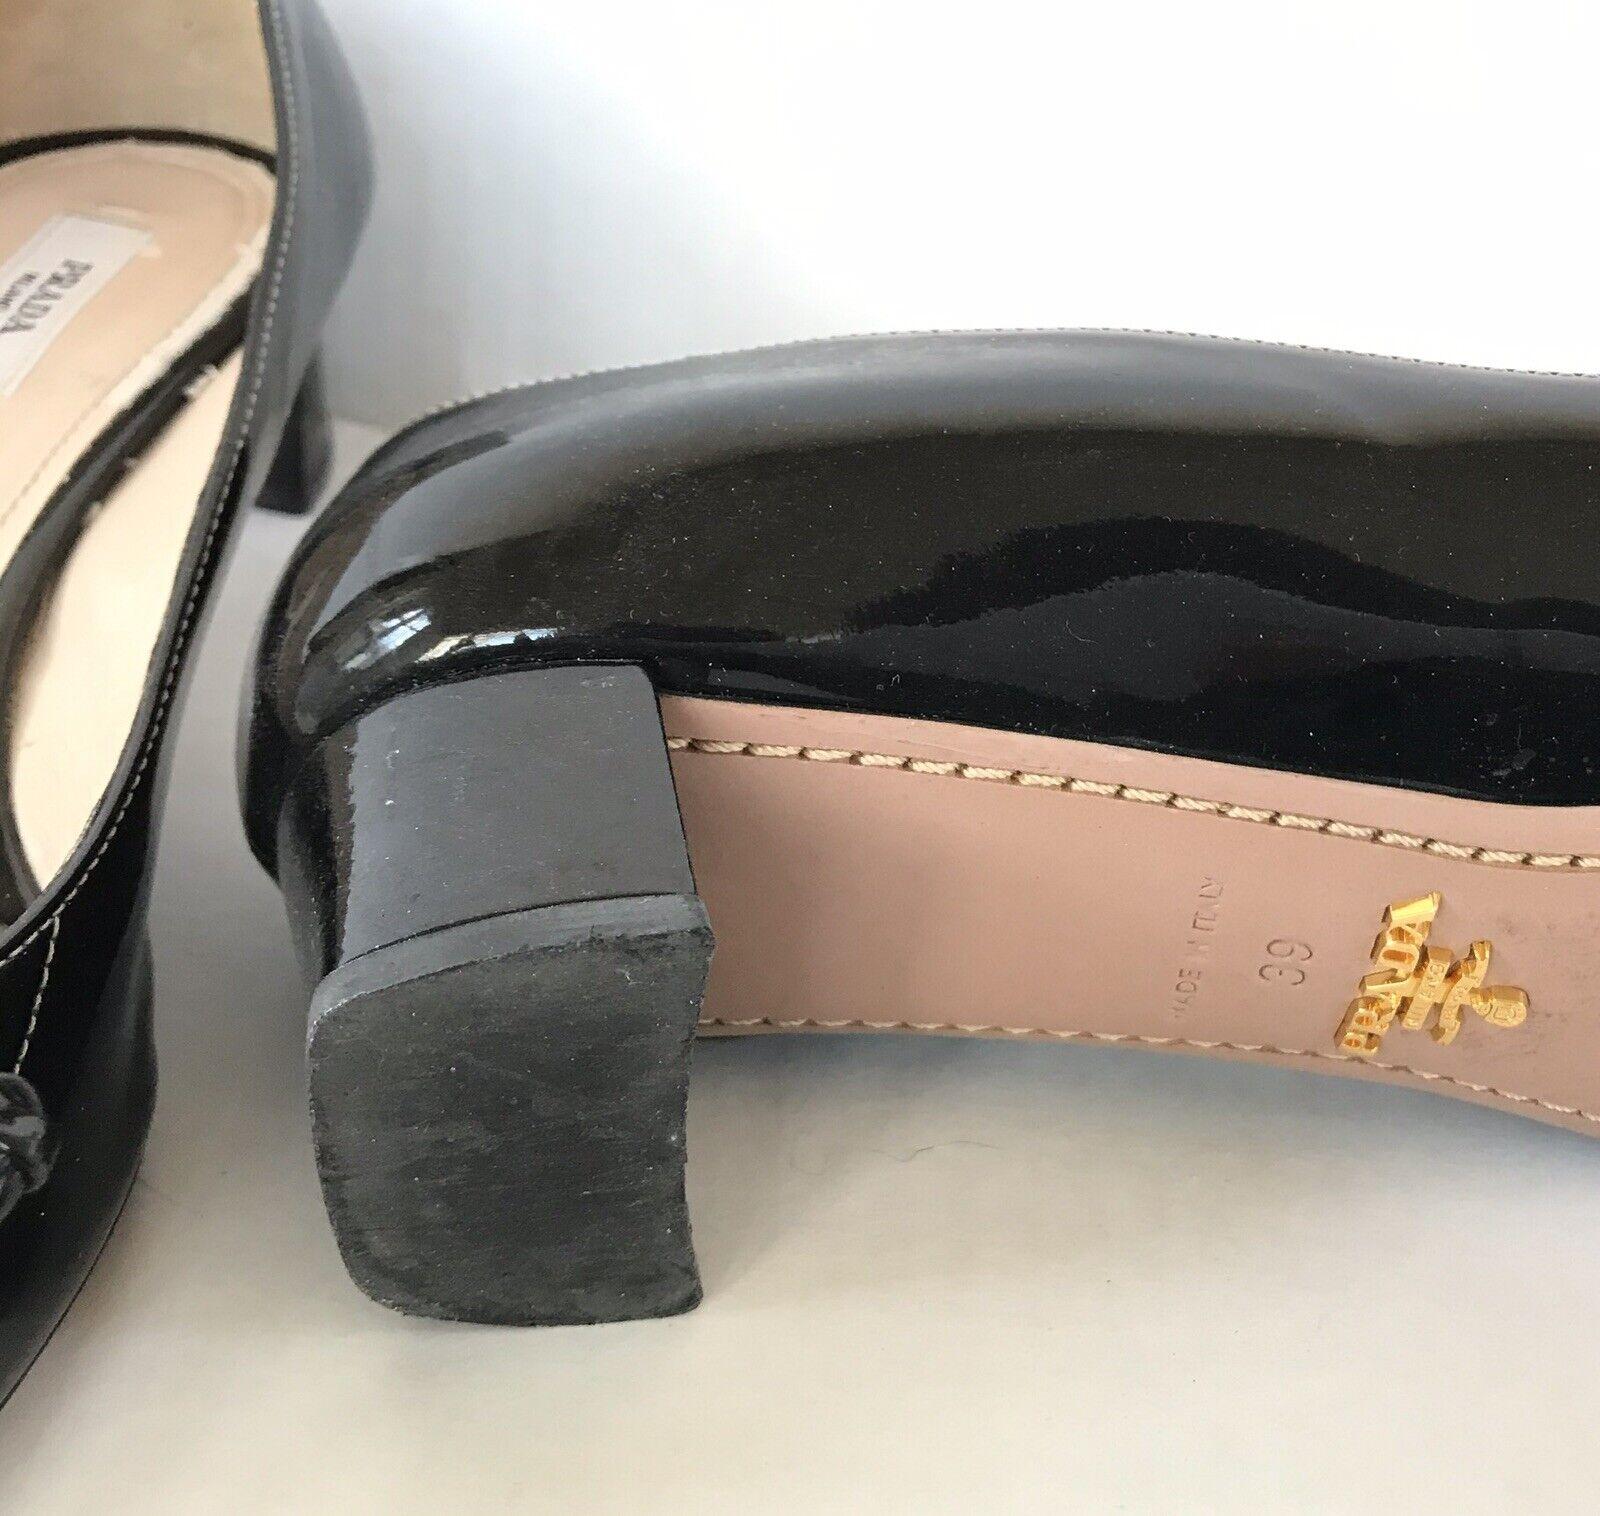 Vintage 1990s Prada Patent Leather Bow Flats Sz 39 - image 3